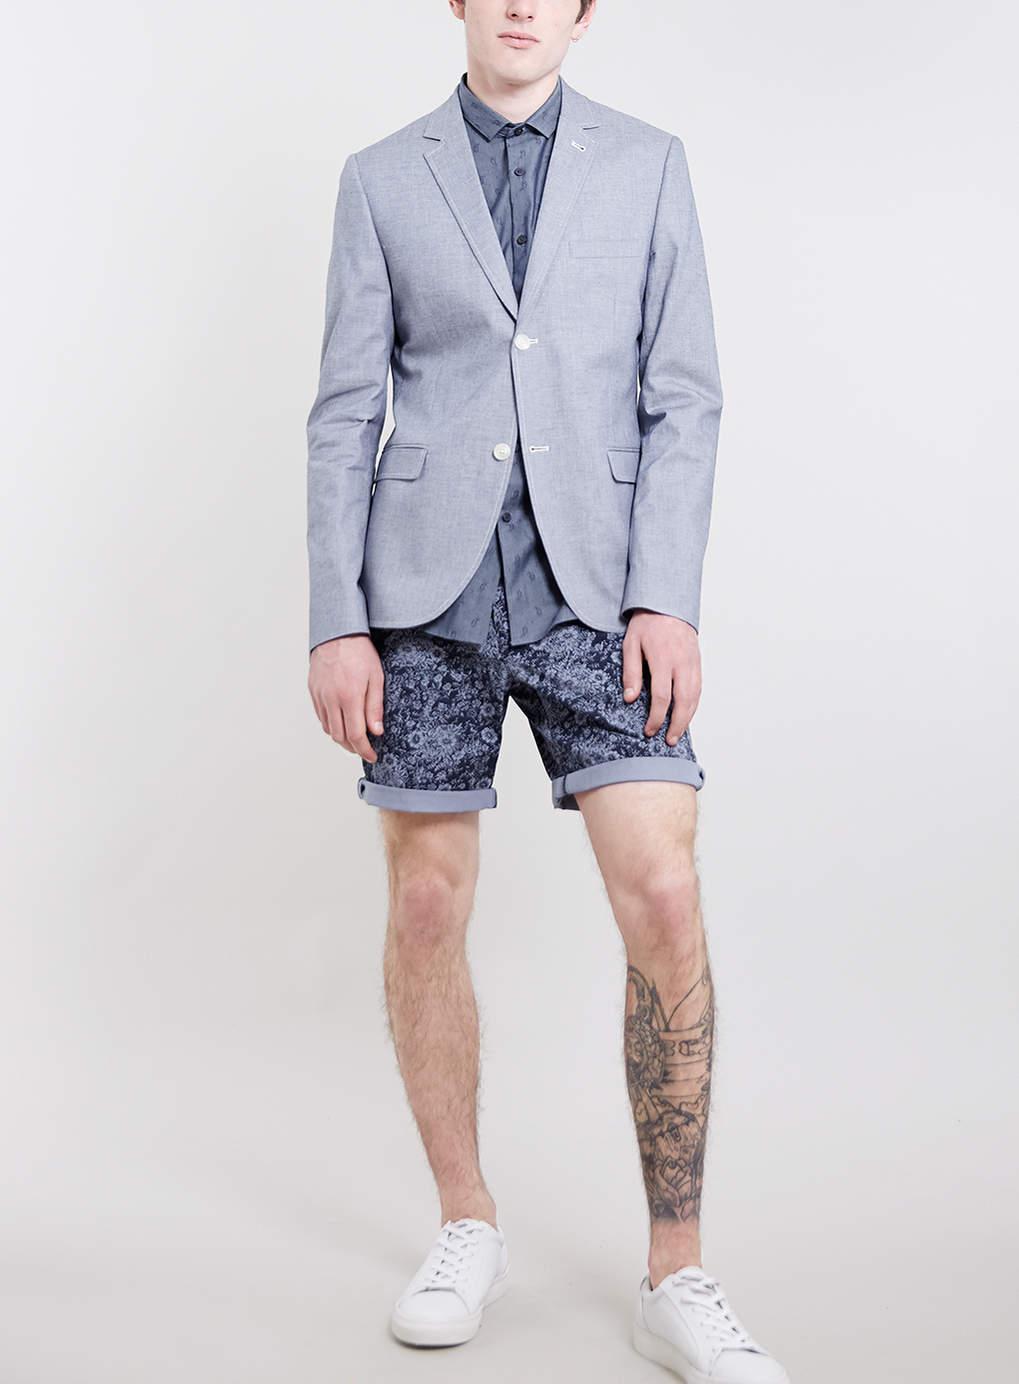 Indigo Oxford Skinny Fit Blazer, $120